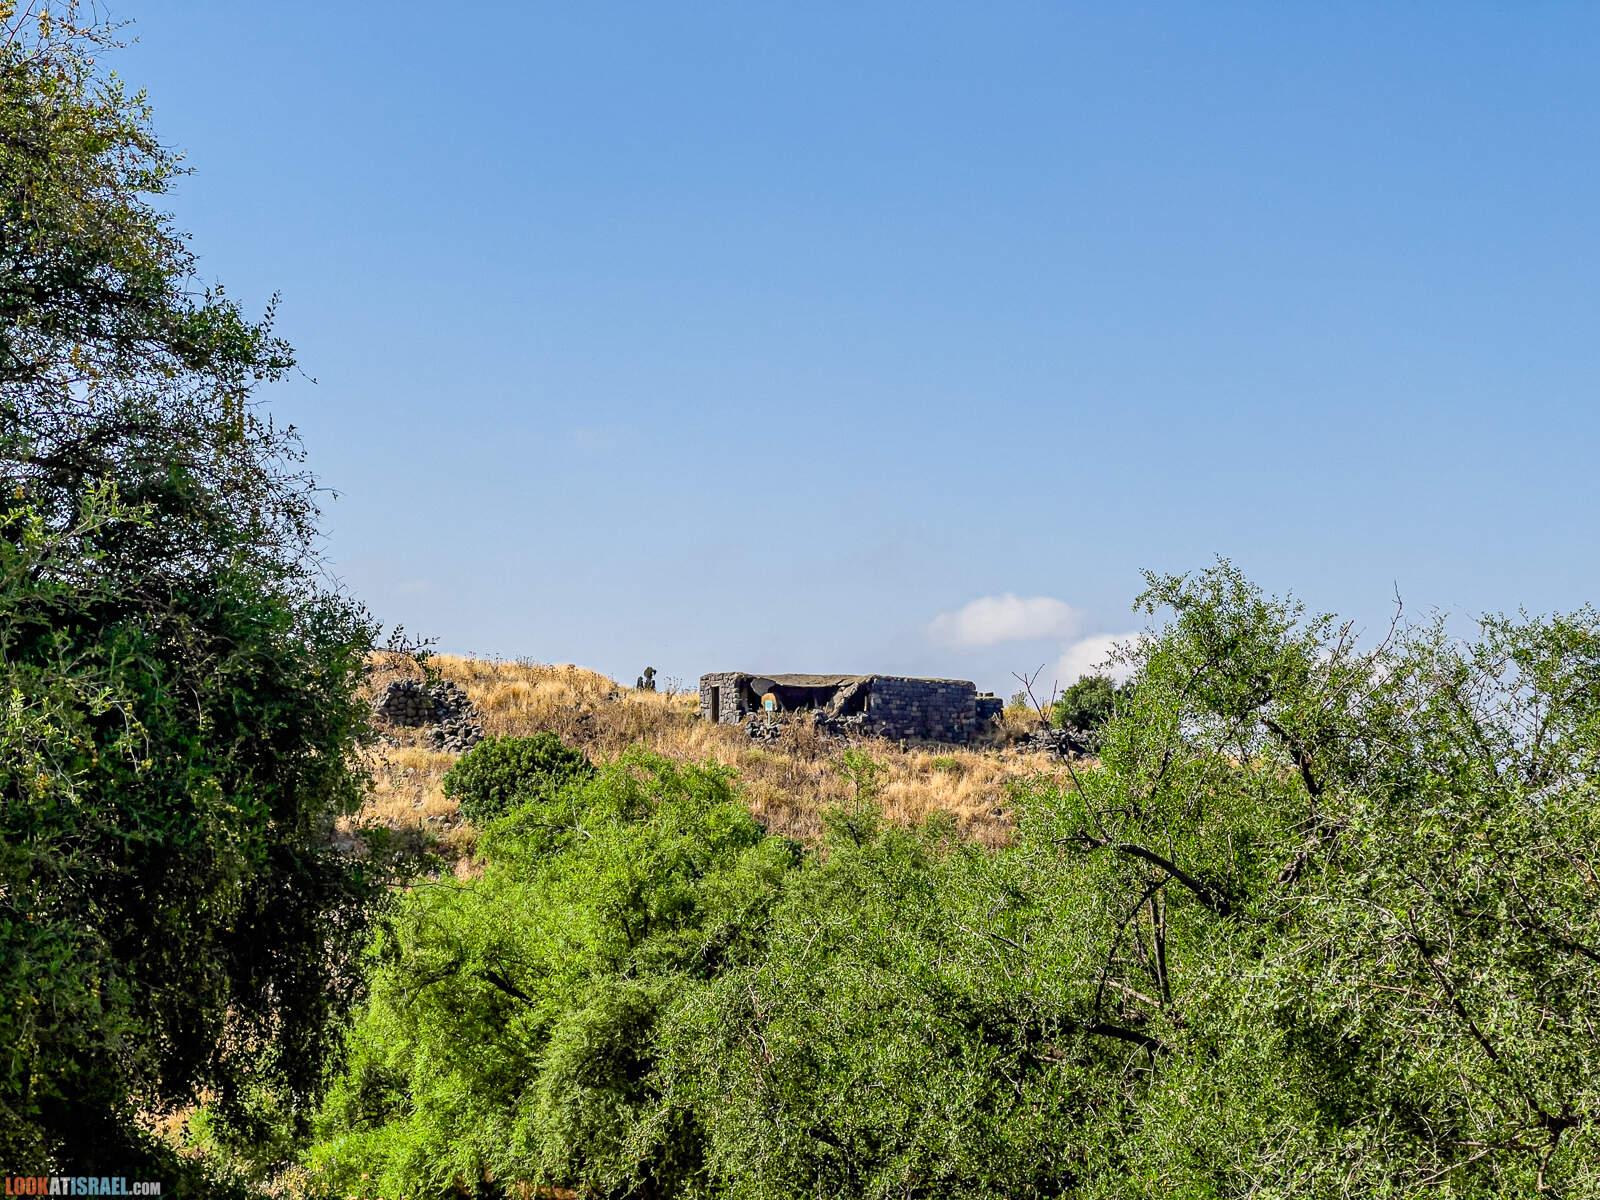 Старый поселок Бней Йеуда (Бир а-Шагум) - Old Bnei Yehuda (Bir a-Shagum) - בני יהודה ישנה ביר א-שגום - LookAtIsrael.com - Фото путешествия по Израилю